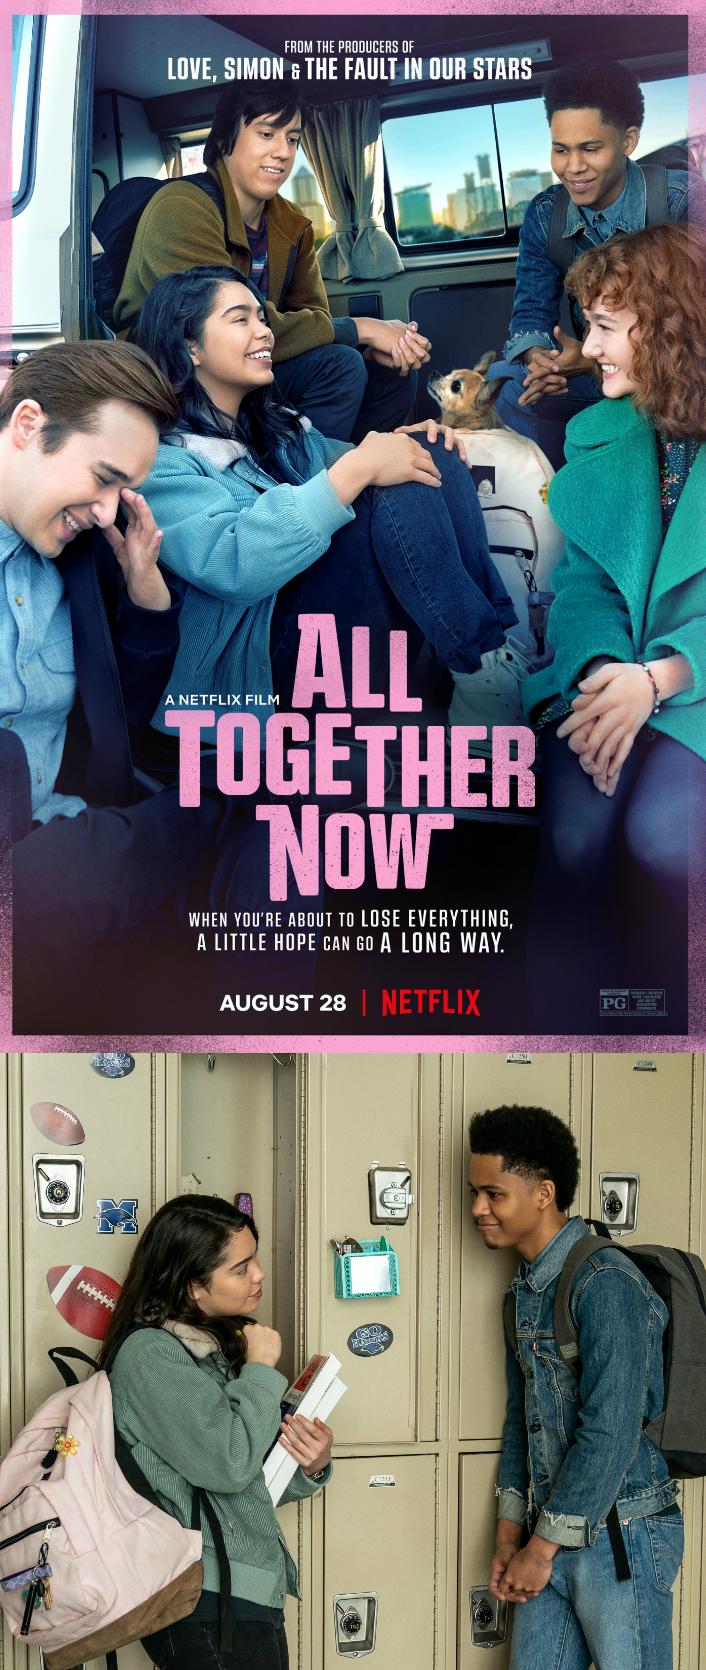 All Together Now on Netflix starting Auli'i Cravalho